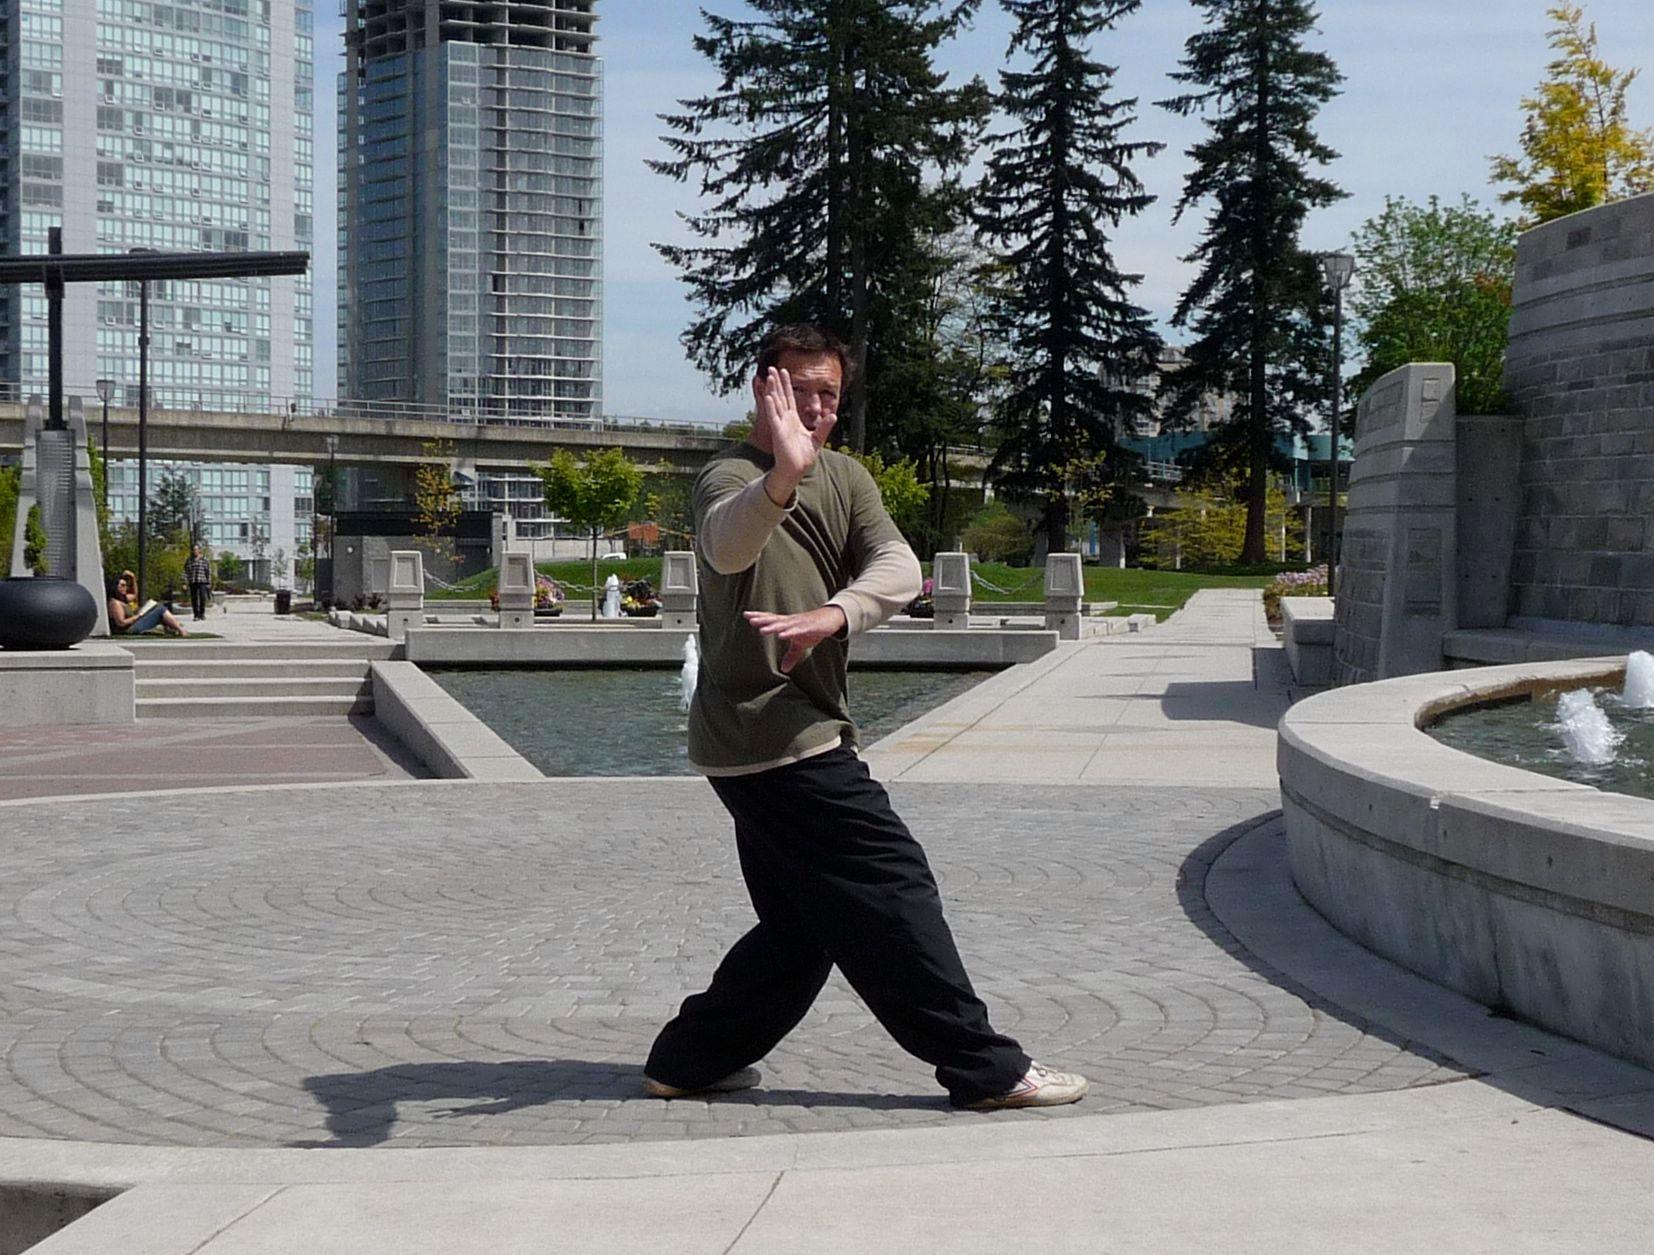 Applications focused Martial Arts (Bagua Vancouver Surrey)